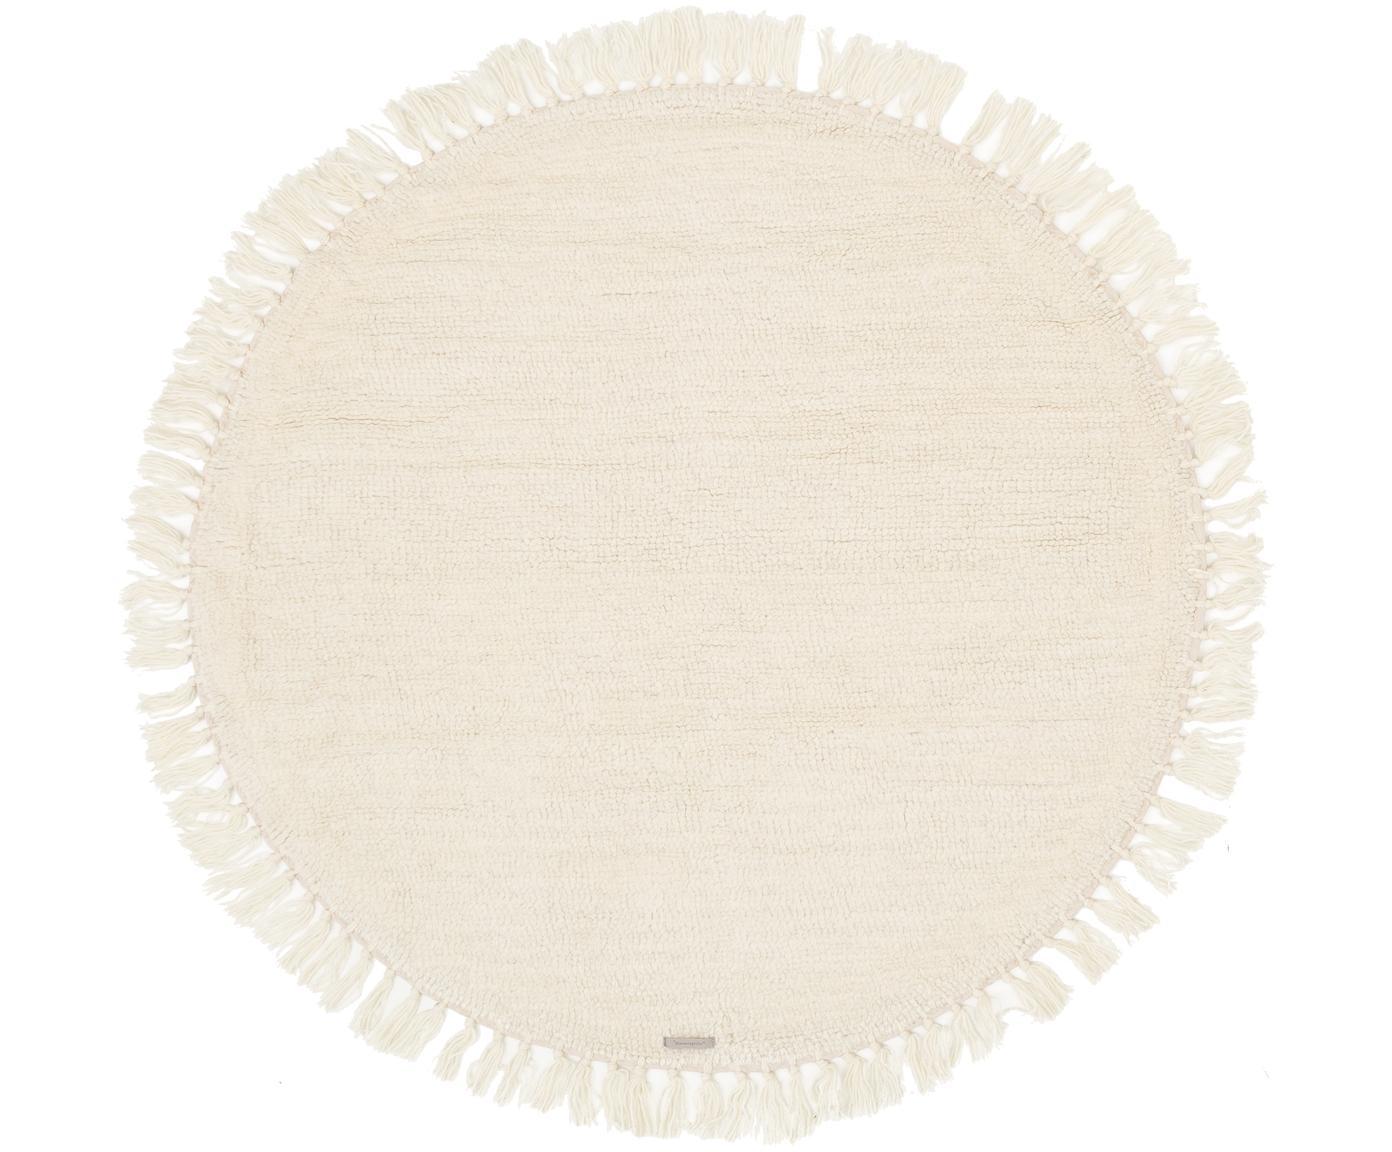 Rond wollen vloerkleed Alma in crème met franjes, Bovenzijde: wol, Onderzijde: wol, Crèmekleurig, Ø 126 cm (maat M)